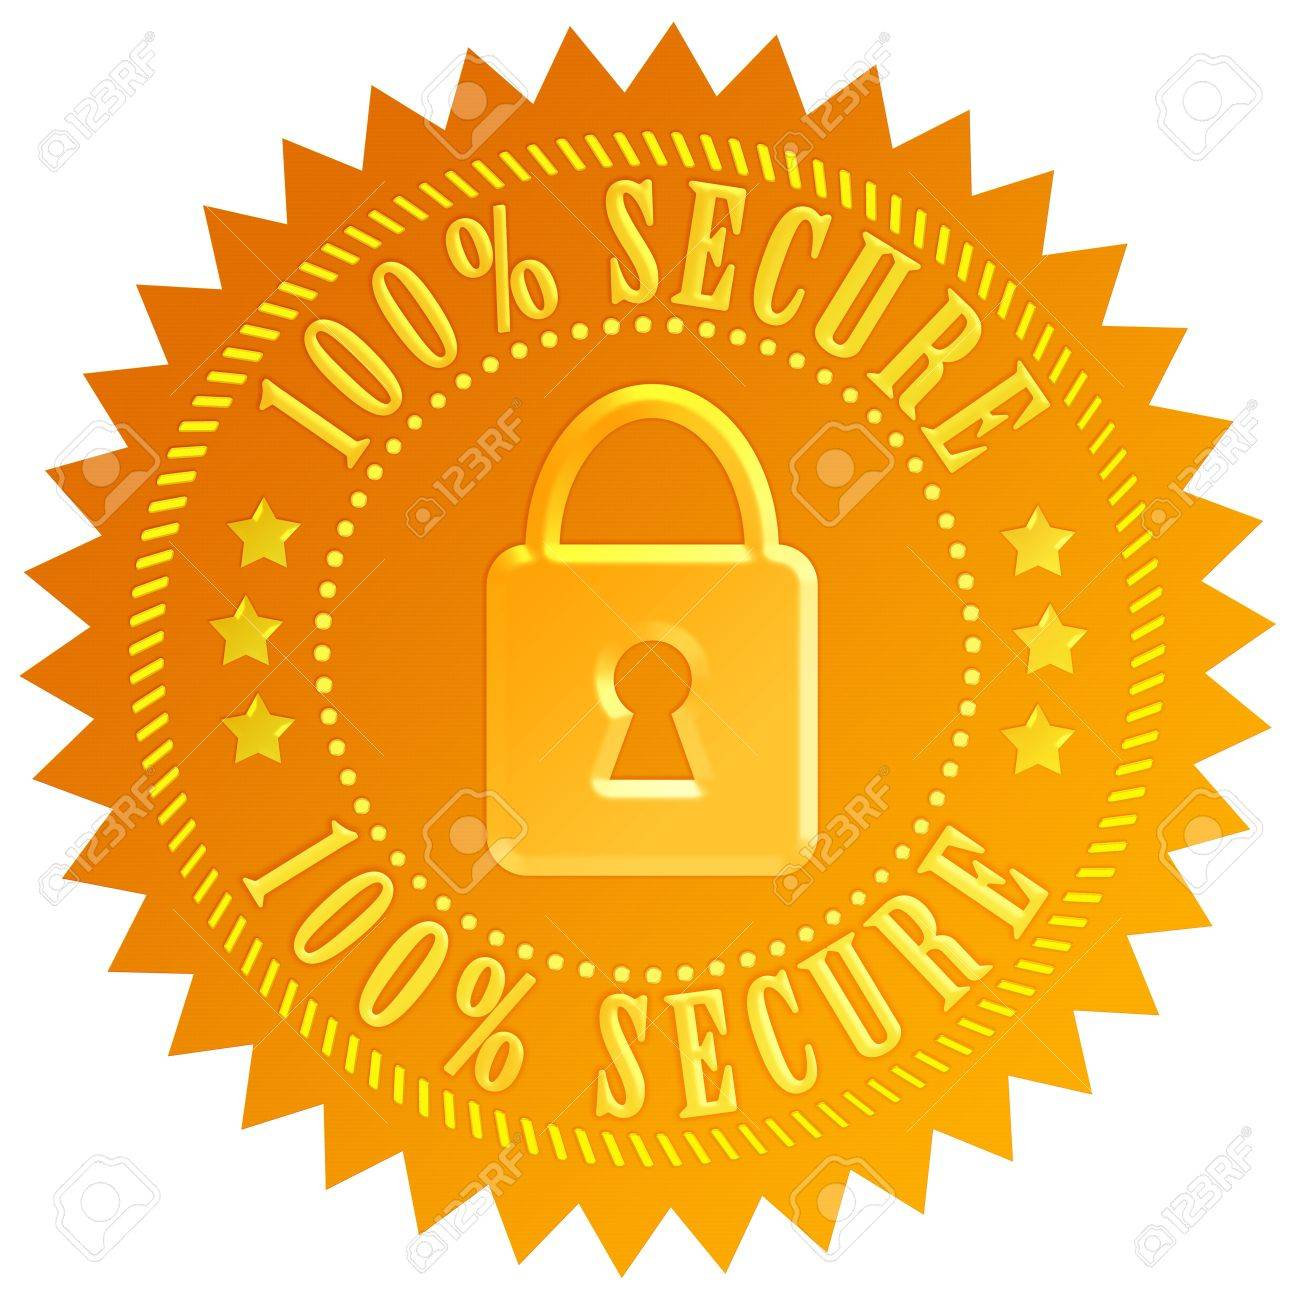 Secure lock emblem Stock Photo - 14755223